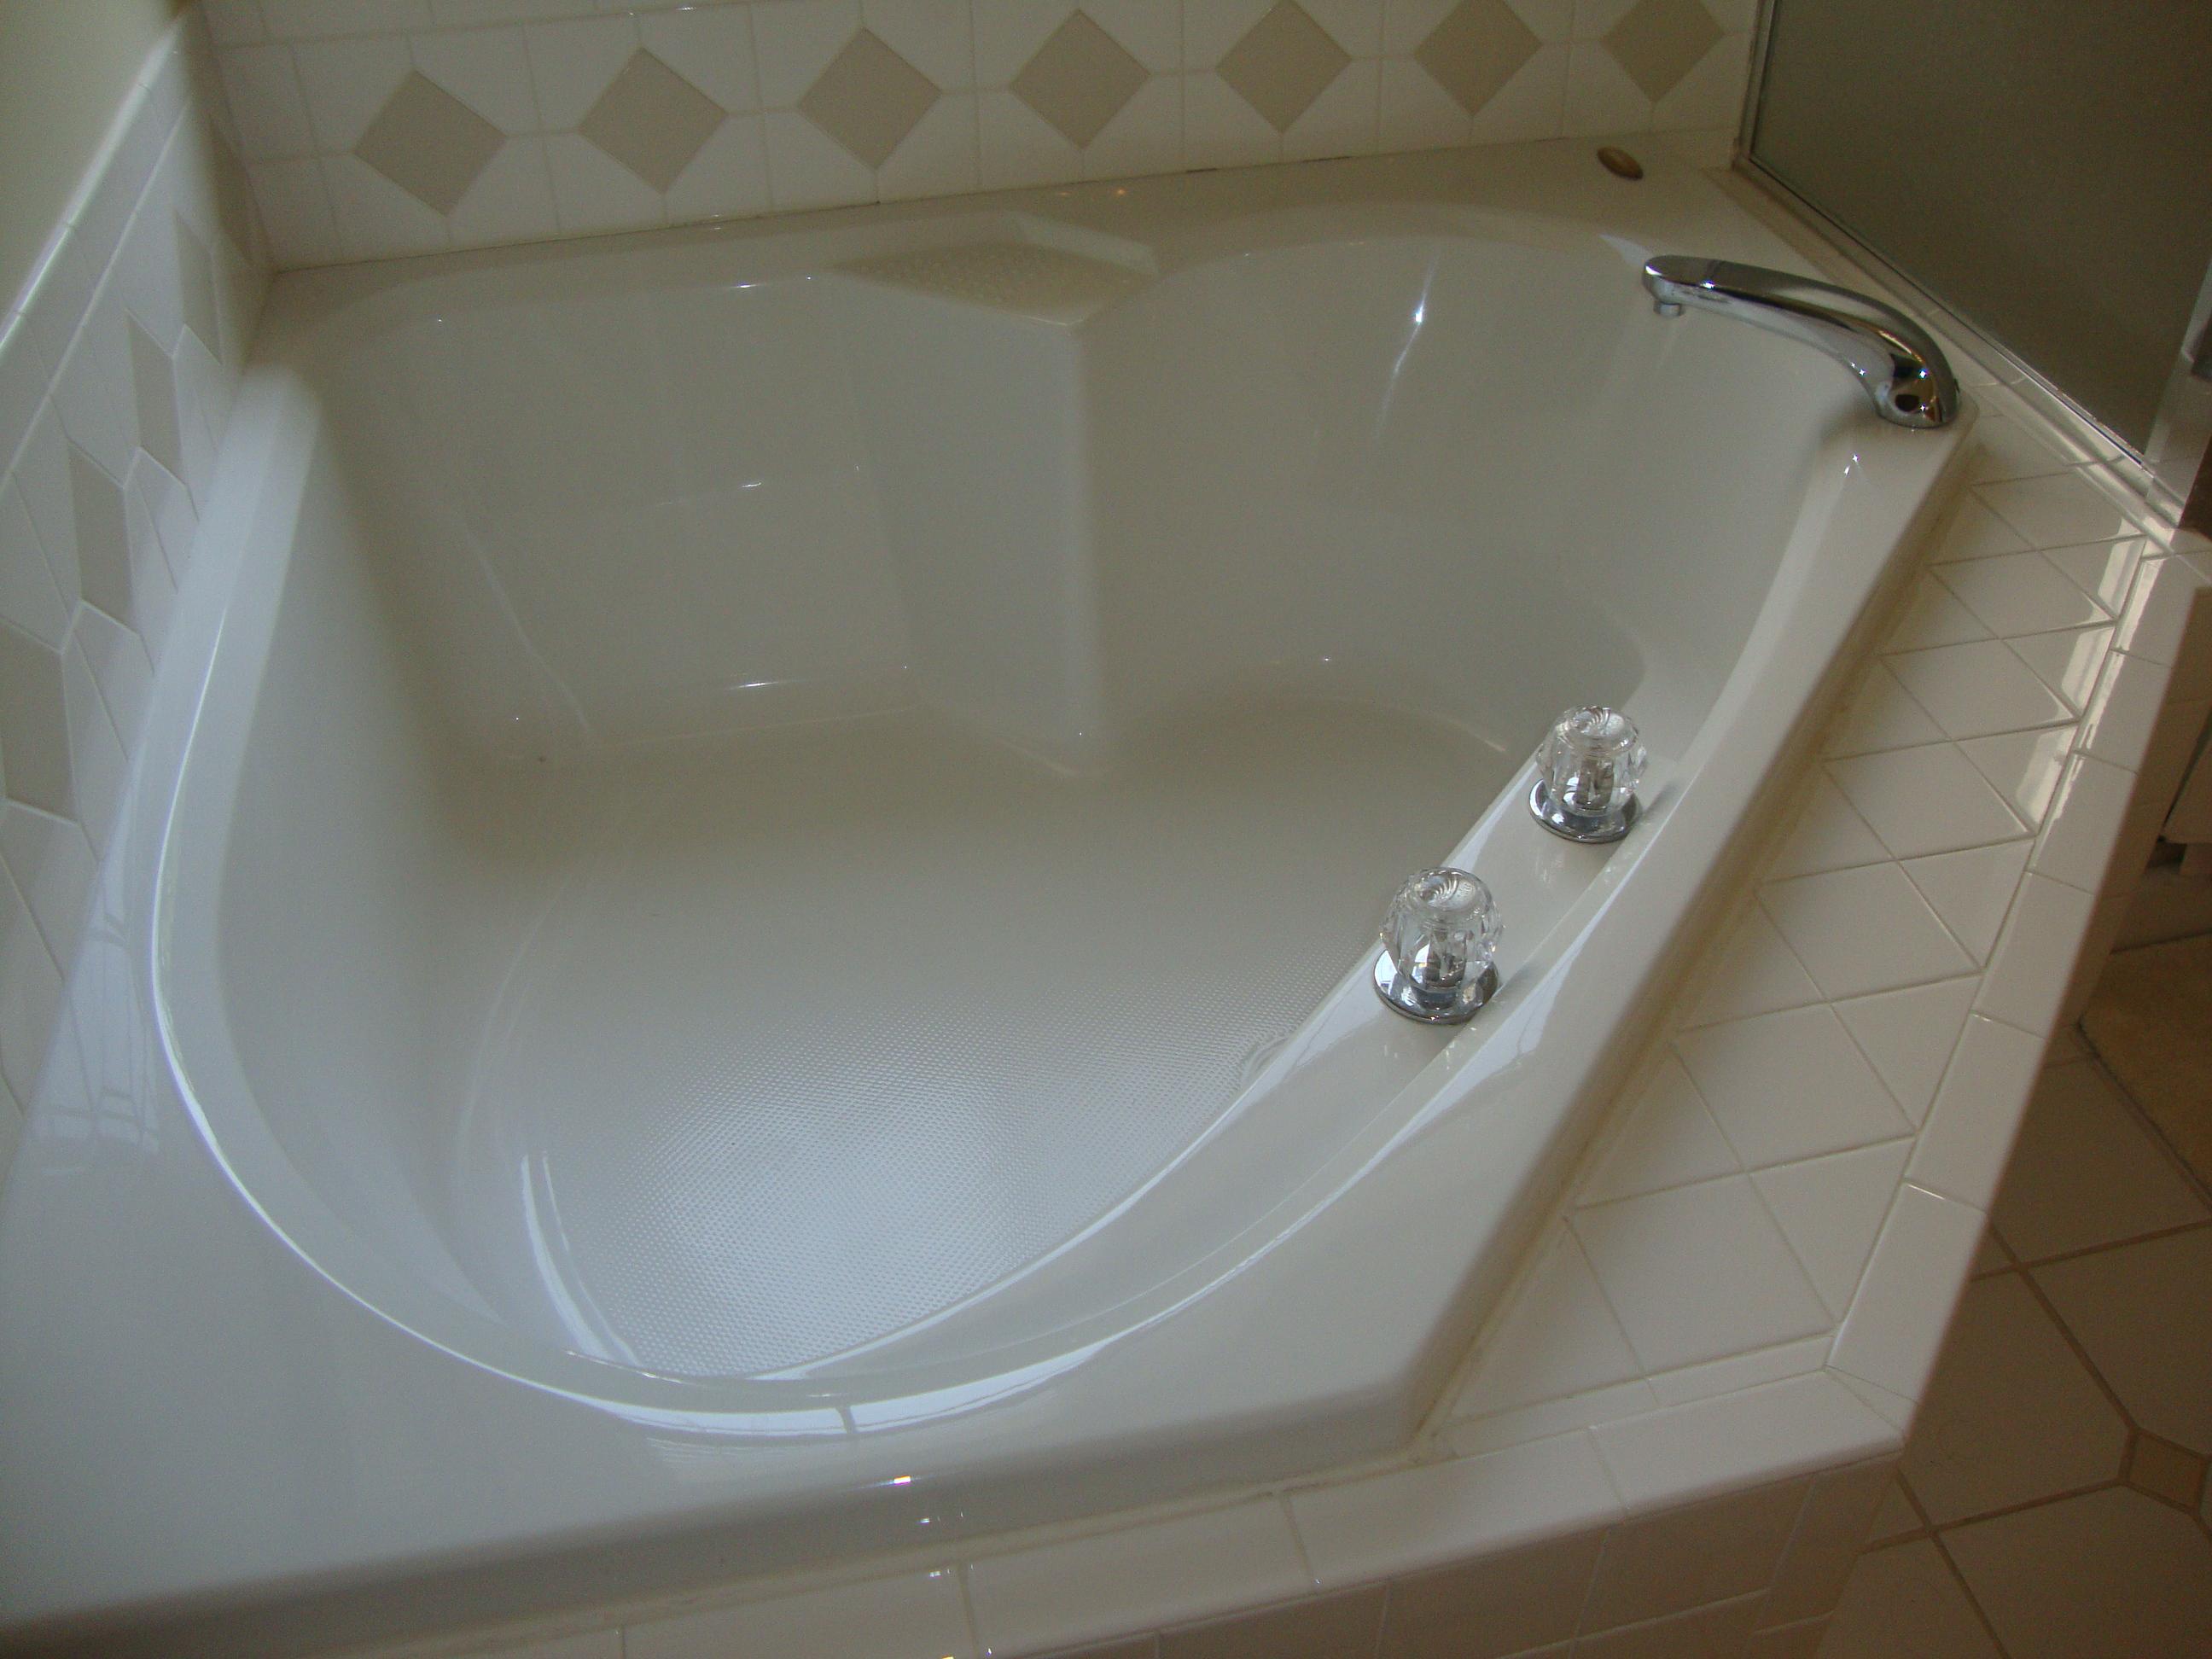 ... Scenery by Enjoying Bath Session on Soaking Tub for Two  HomesFeed